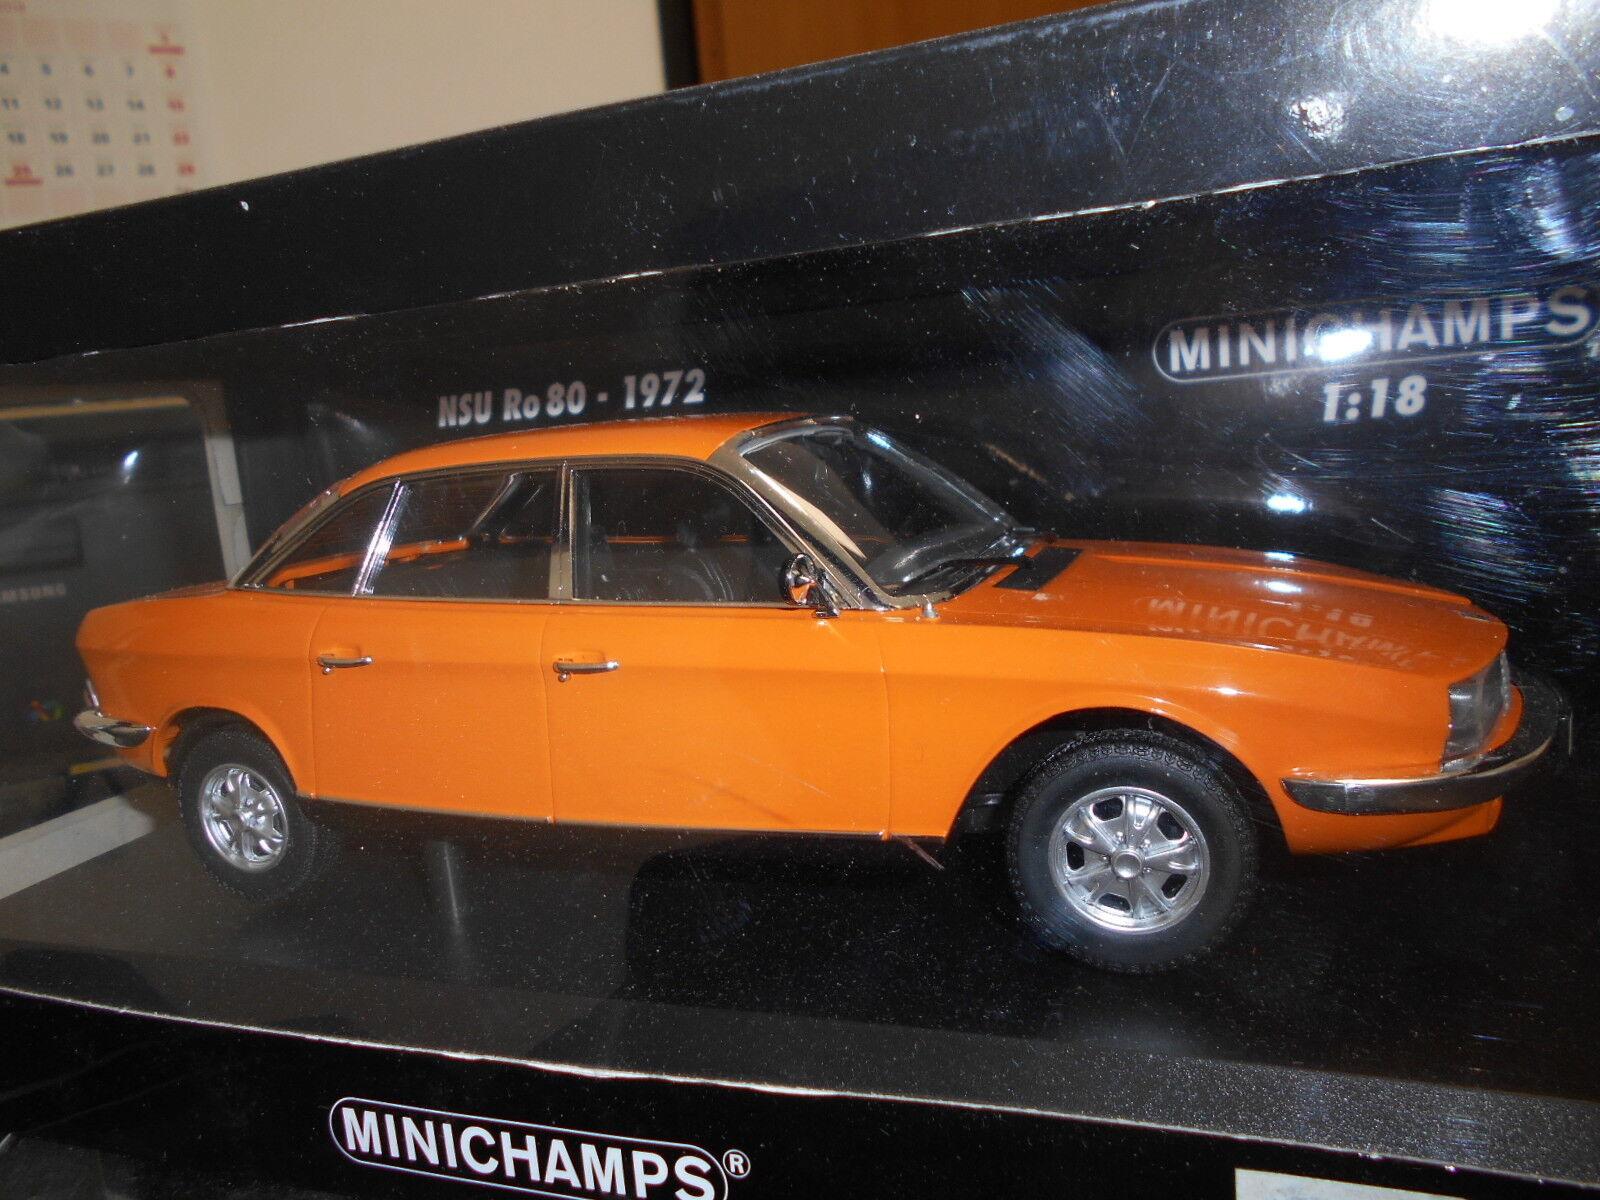 MIN151015401 by MINICHAMPS NSU RO 80 1972 1:18